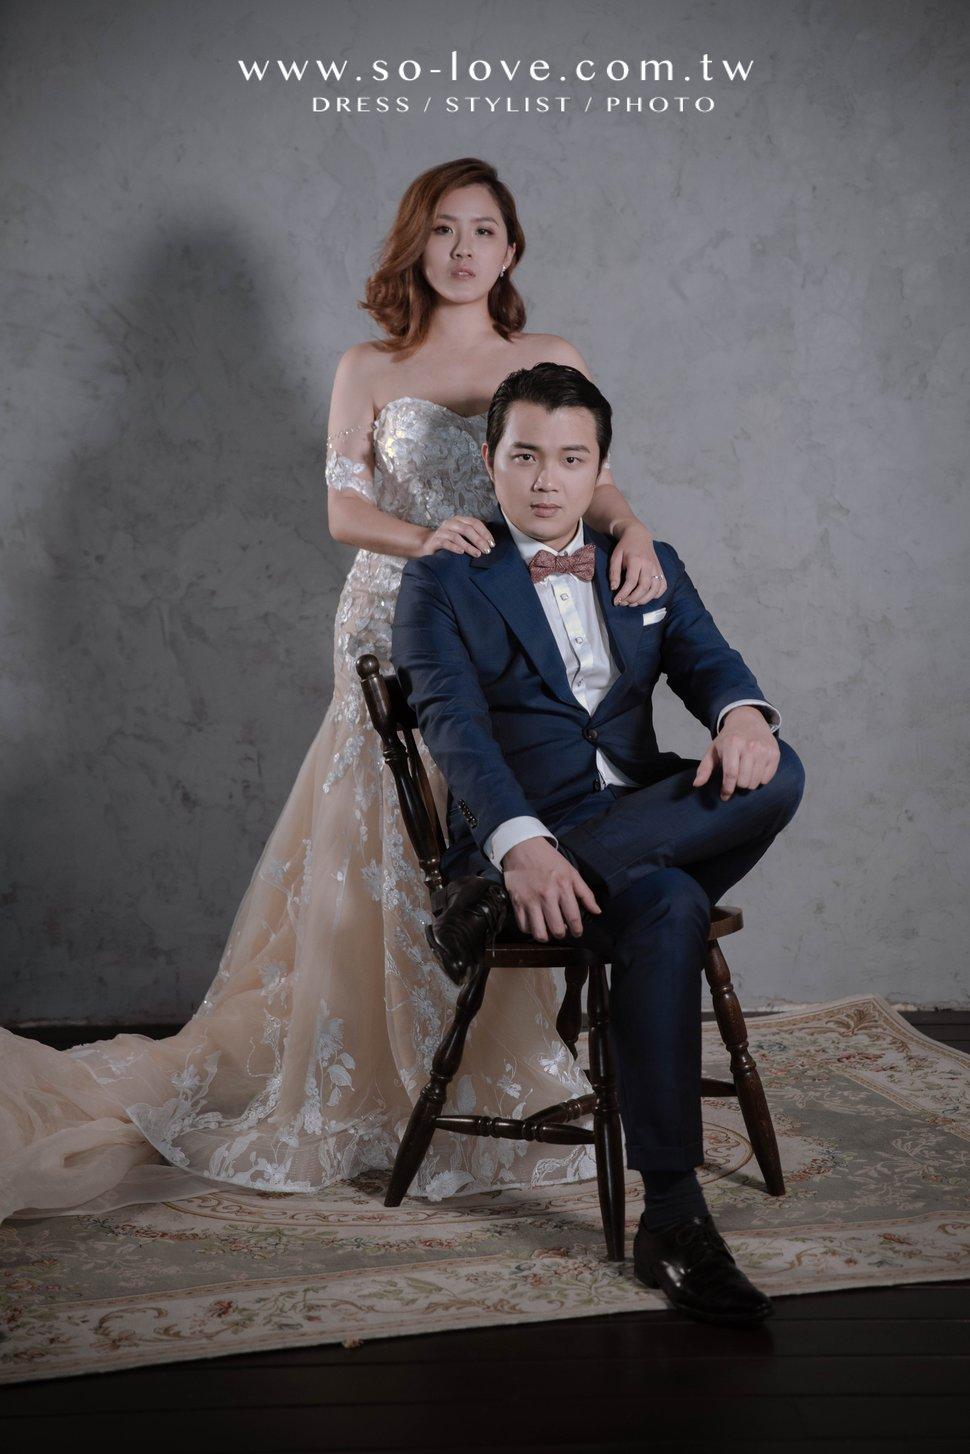 GYDSC02713 - So.Love Wedding 樂樂蕾絲《結婚吧》